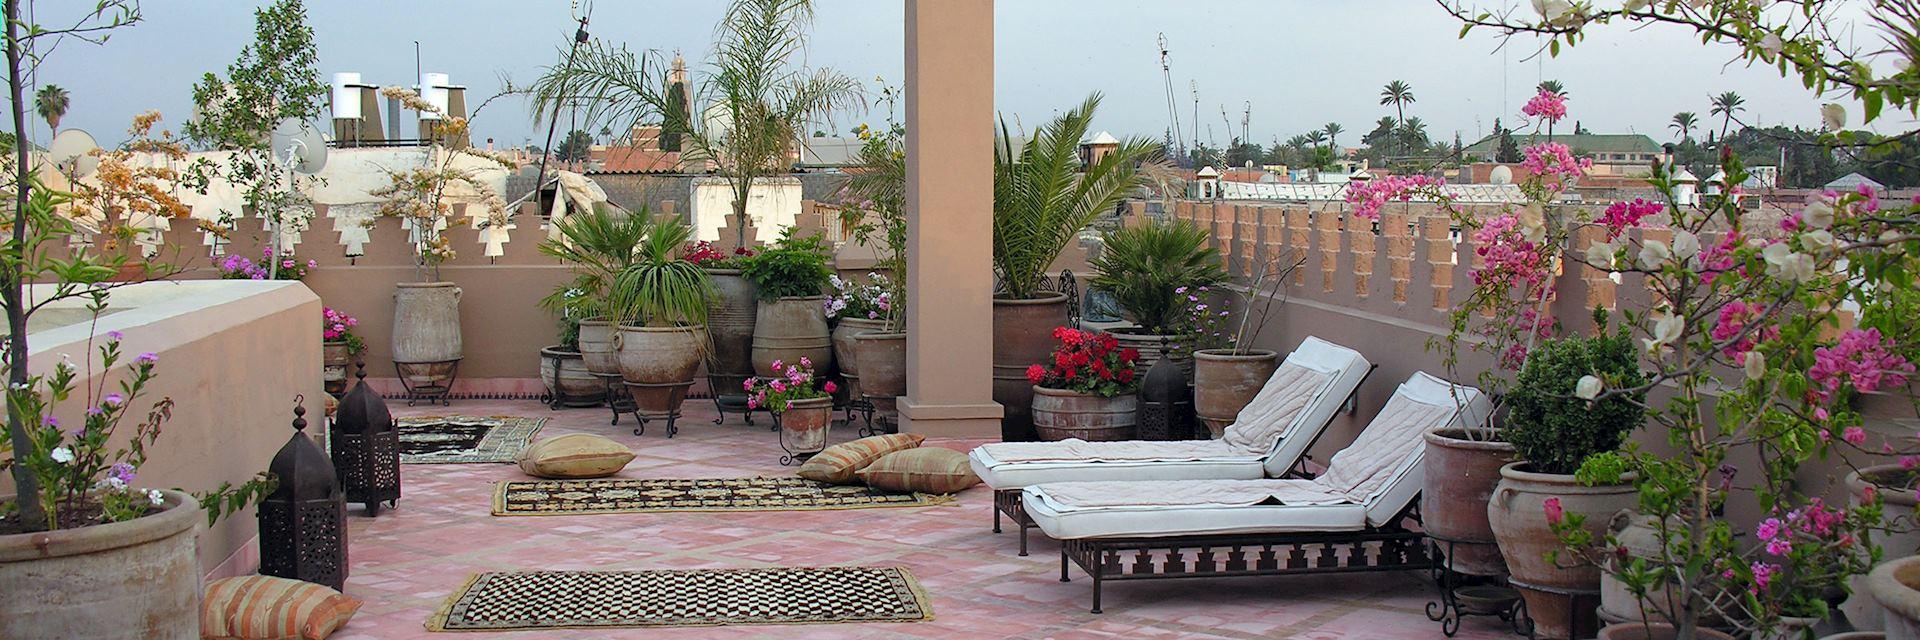 Riad Kniza, Marrakesh